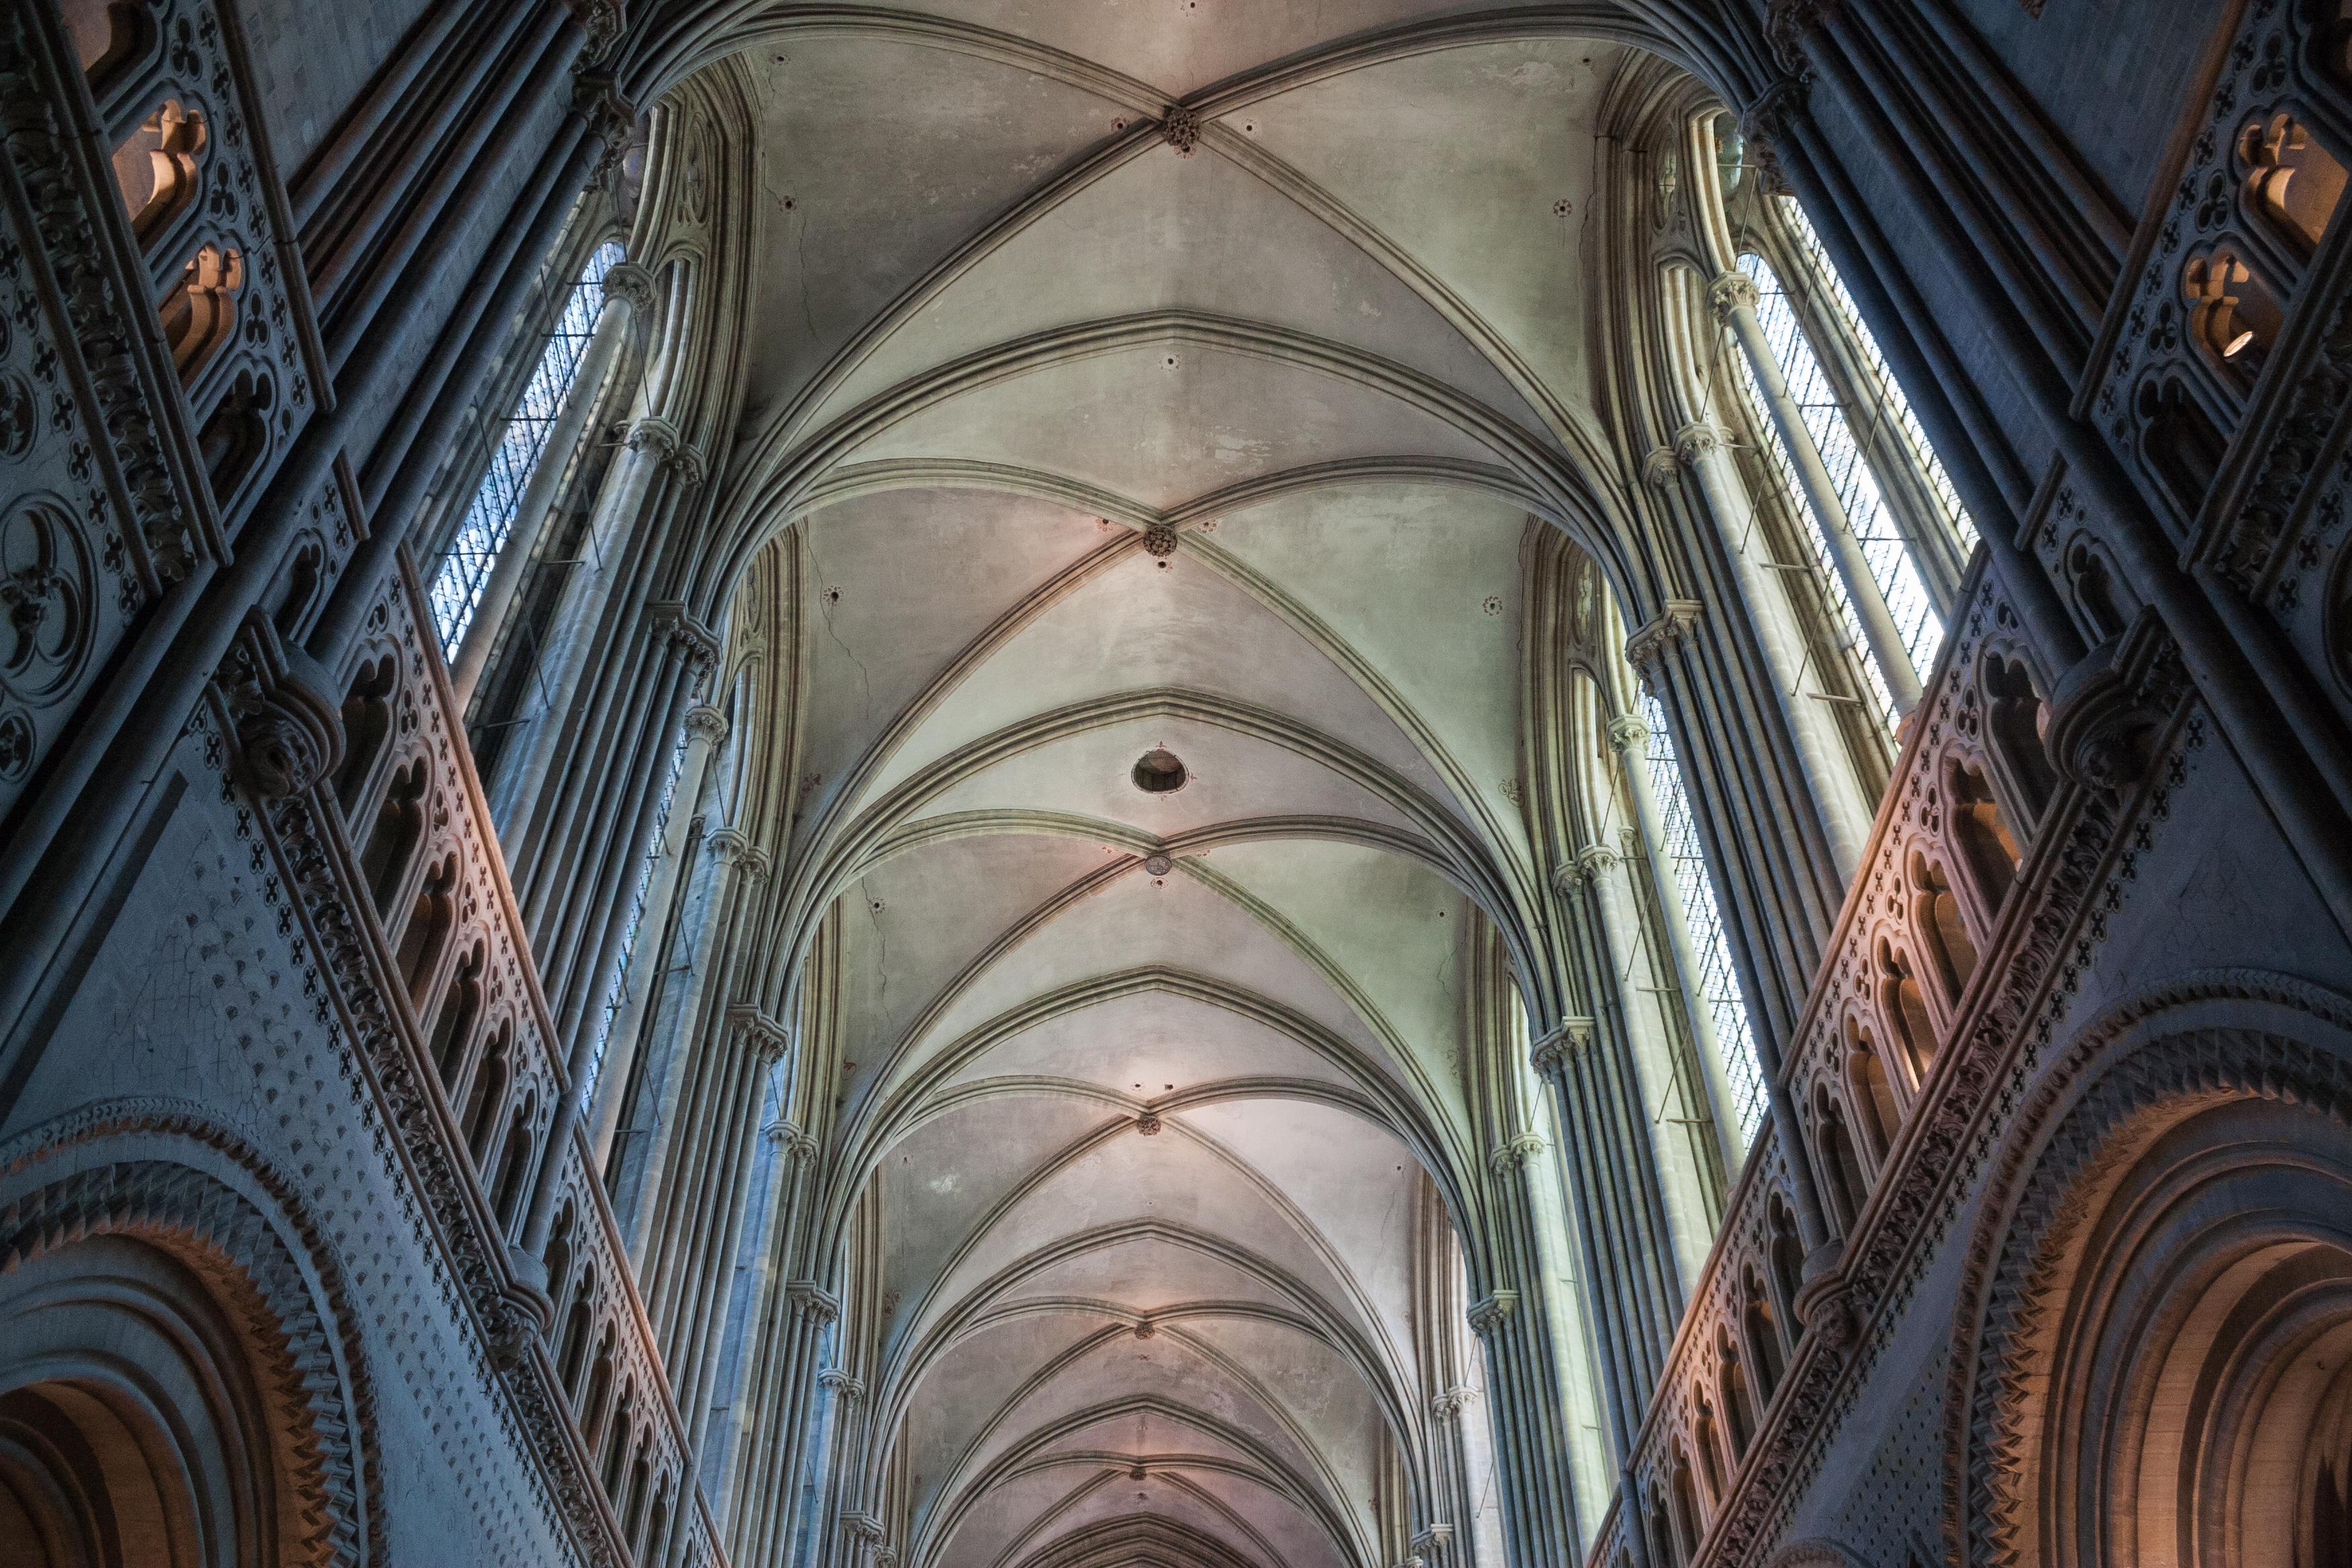 Filebayeux Cathédrale Notre Dame Nef Voûte 2016 08 22jpg